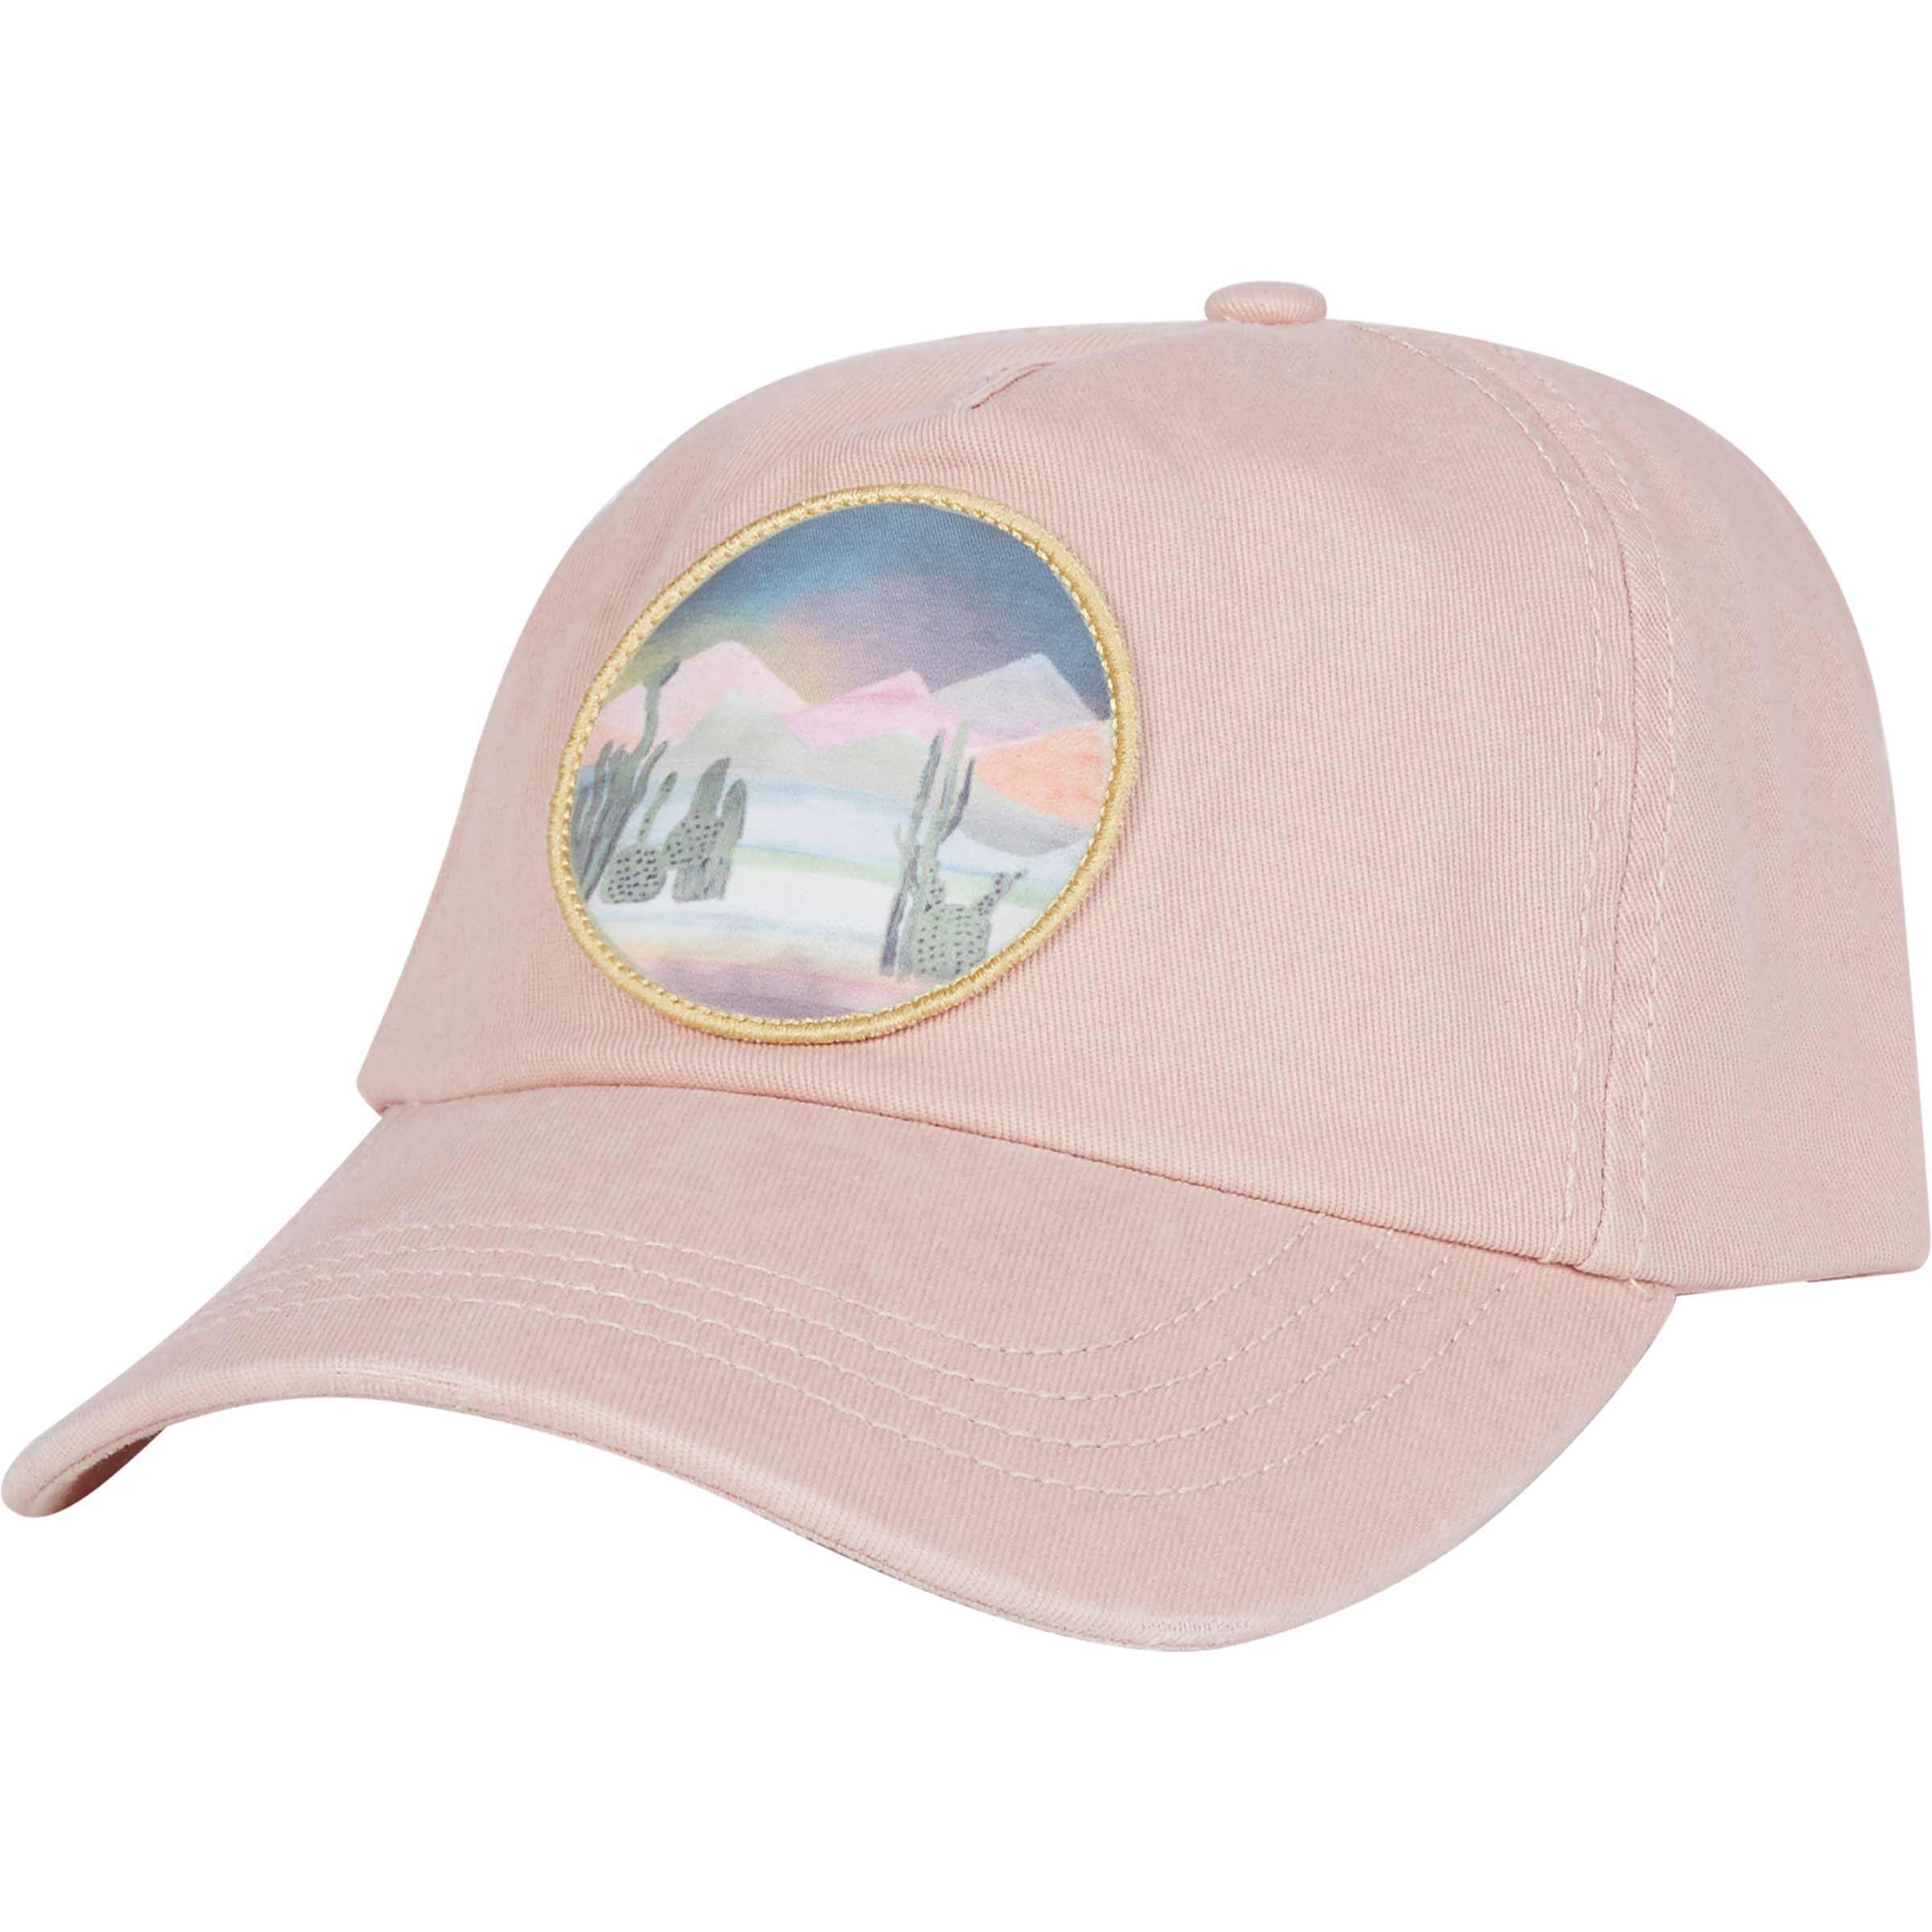 40b7999314e ... get lyst billabong surf club hat in pink 91d20 eb1ec